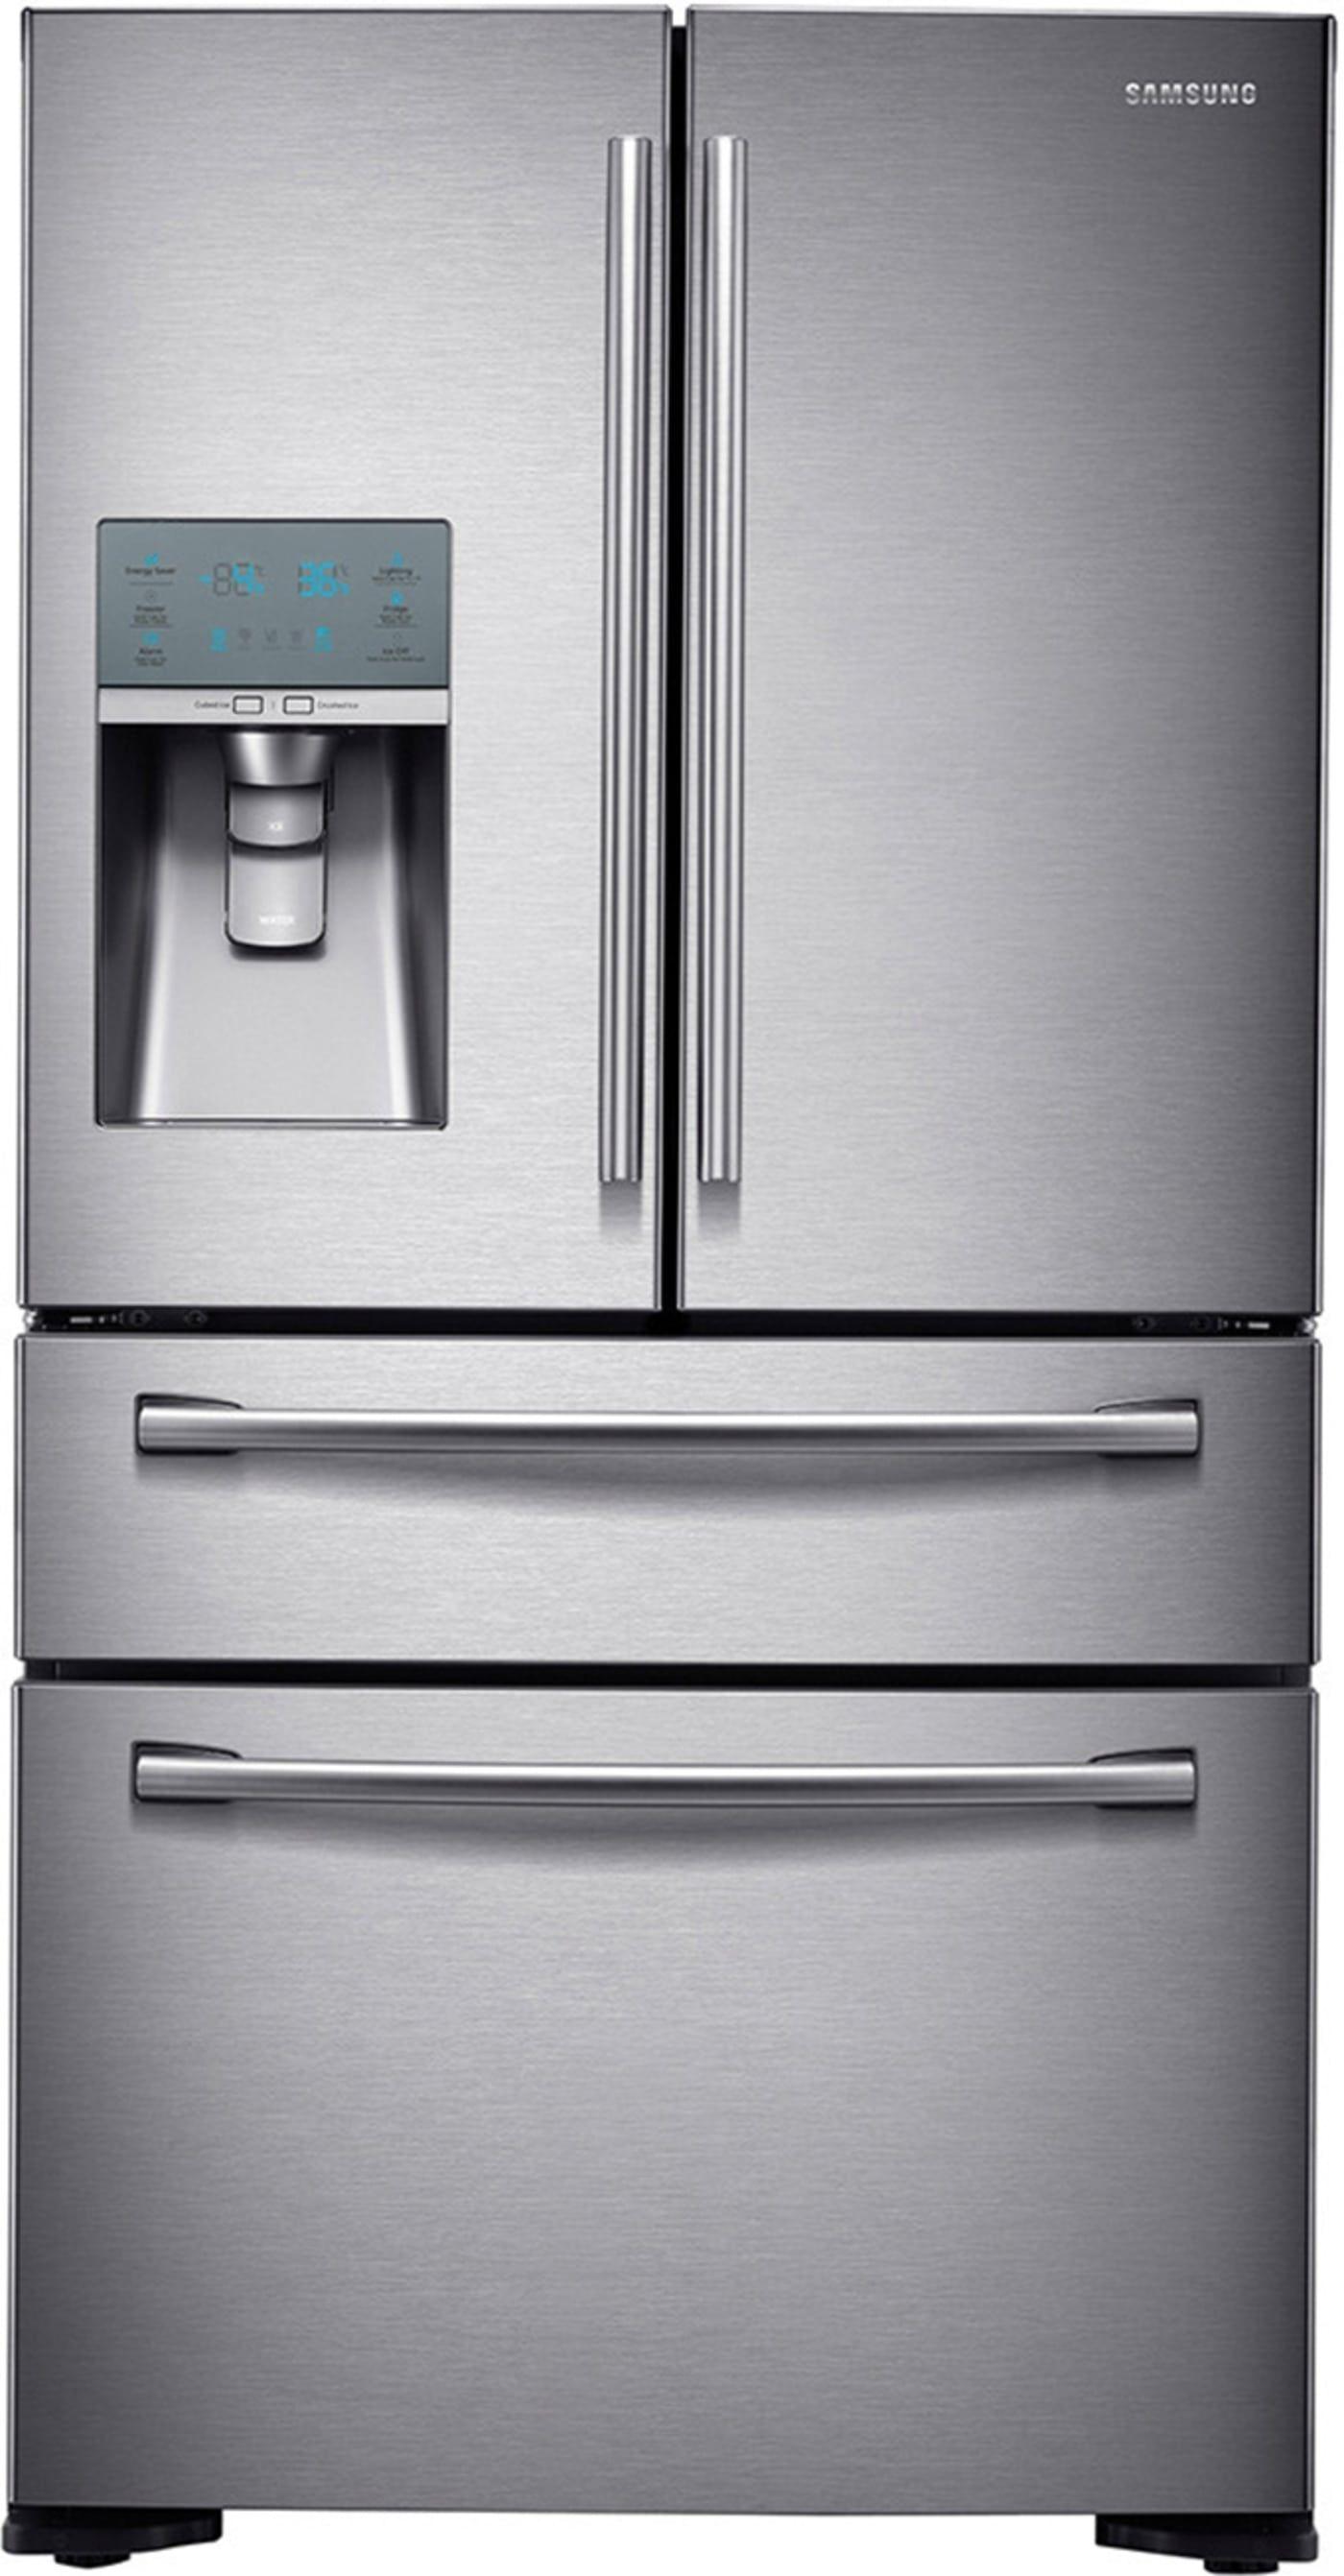 Rf24fsedbsr By Samsung French Door Refrigerators Goedekers Com French Door Refrigerator Samsung Fridge Samsung French Door